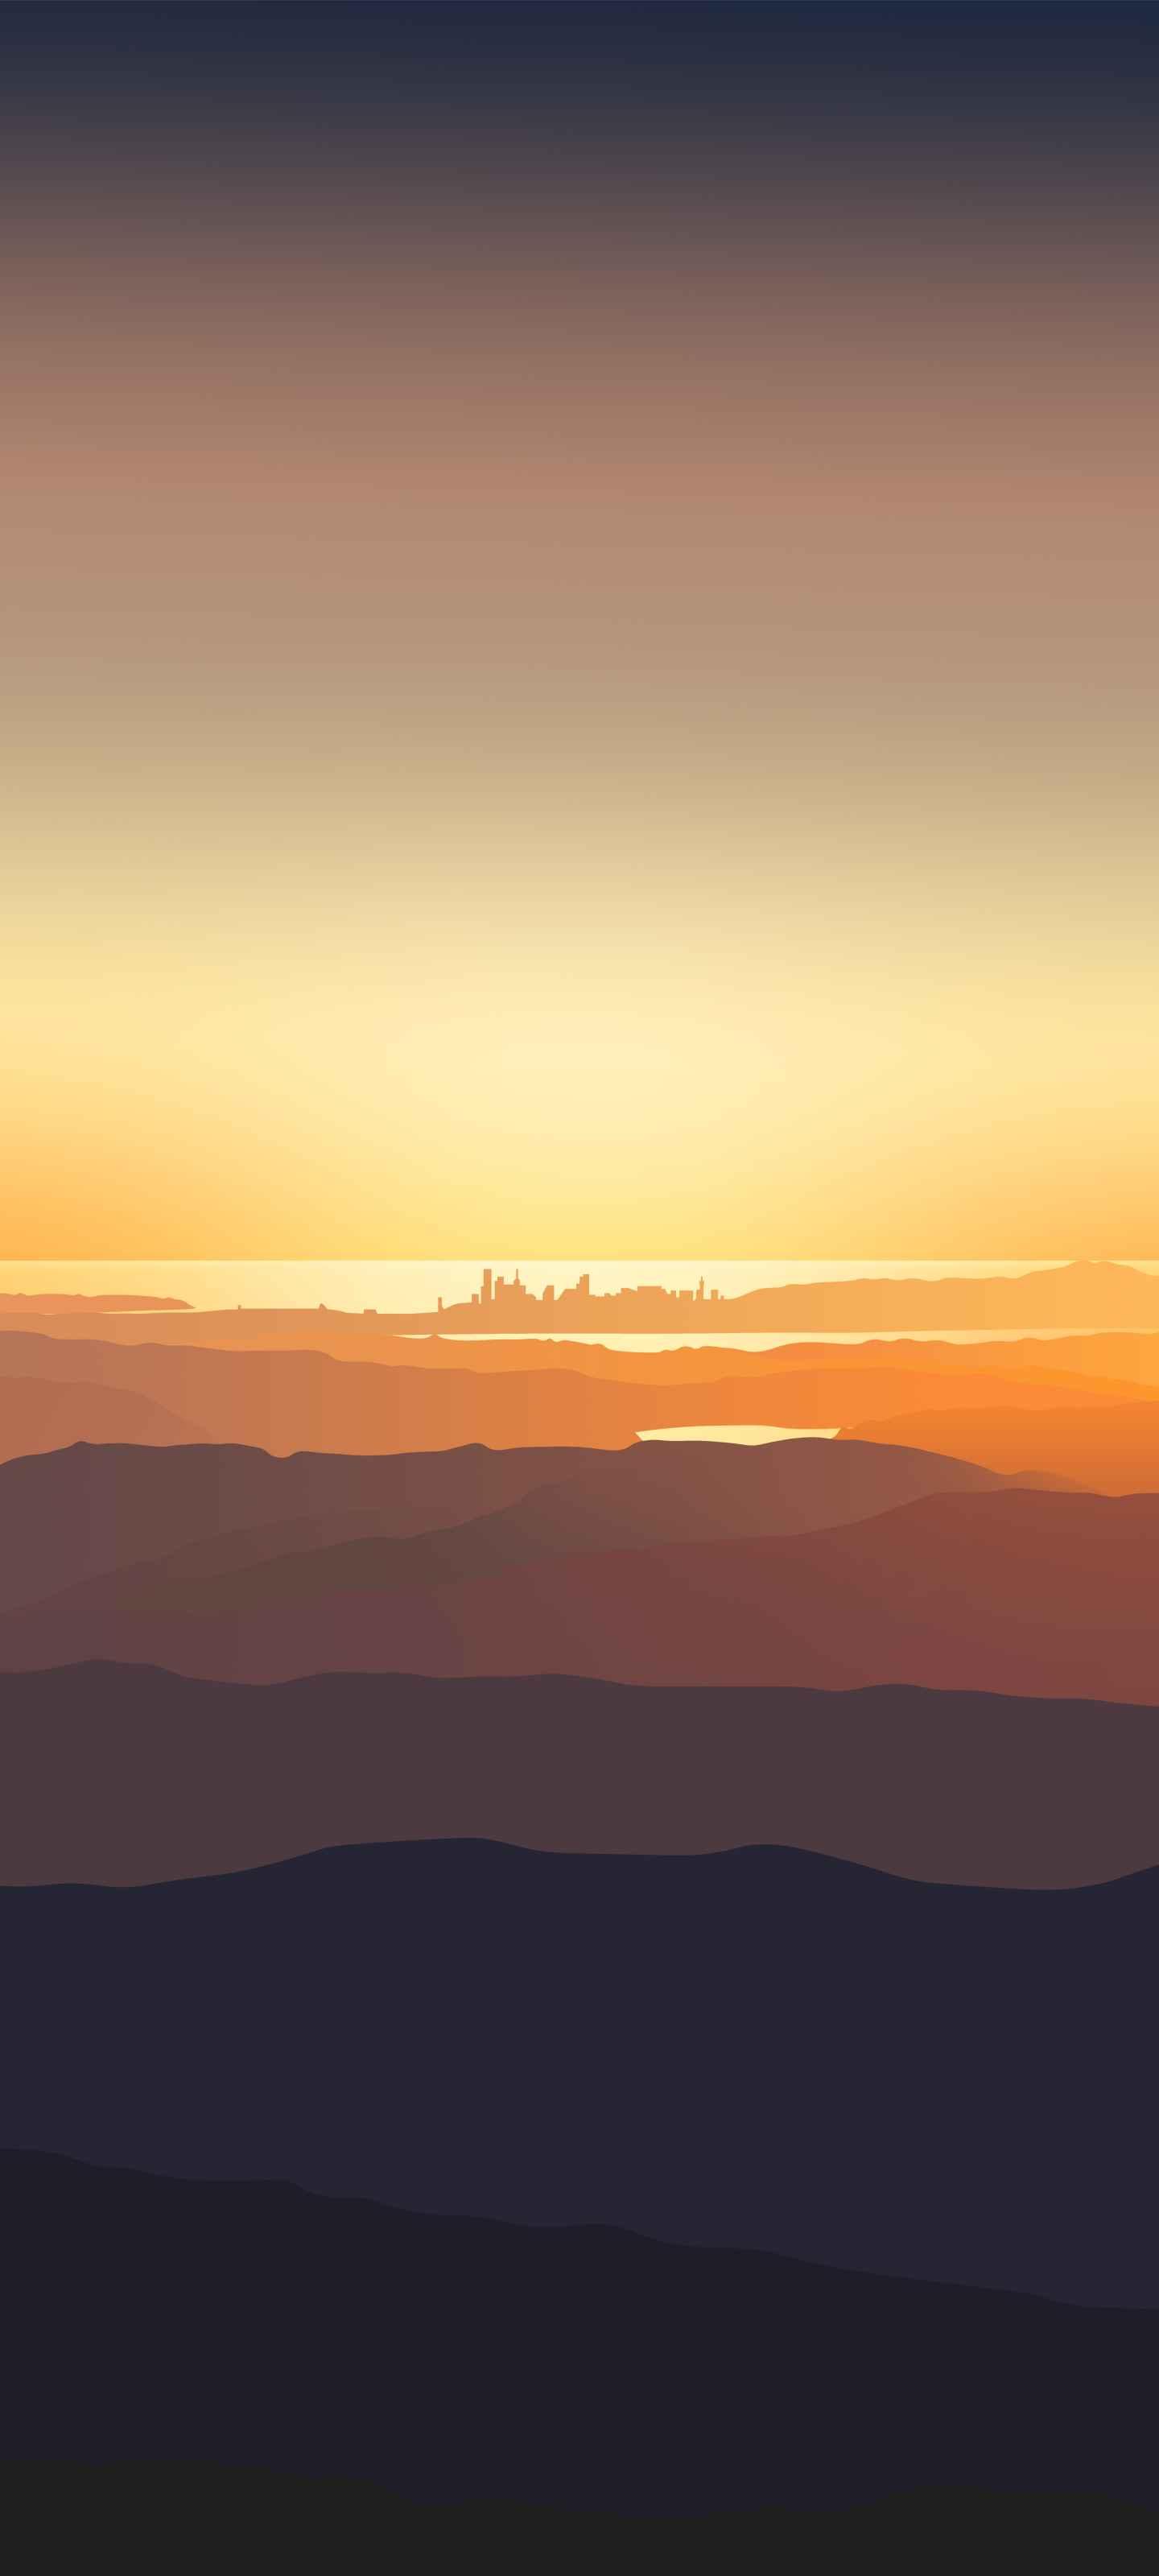 Sunset City iPhone Wallpaper